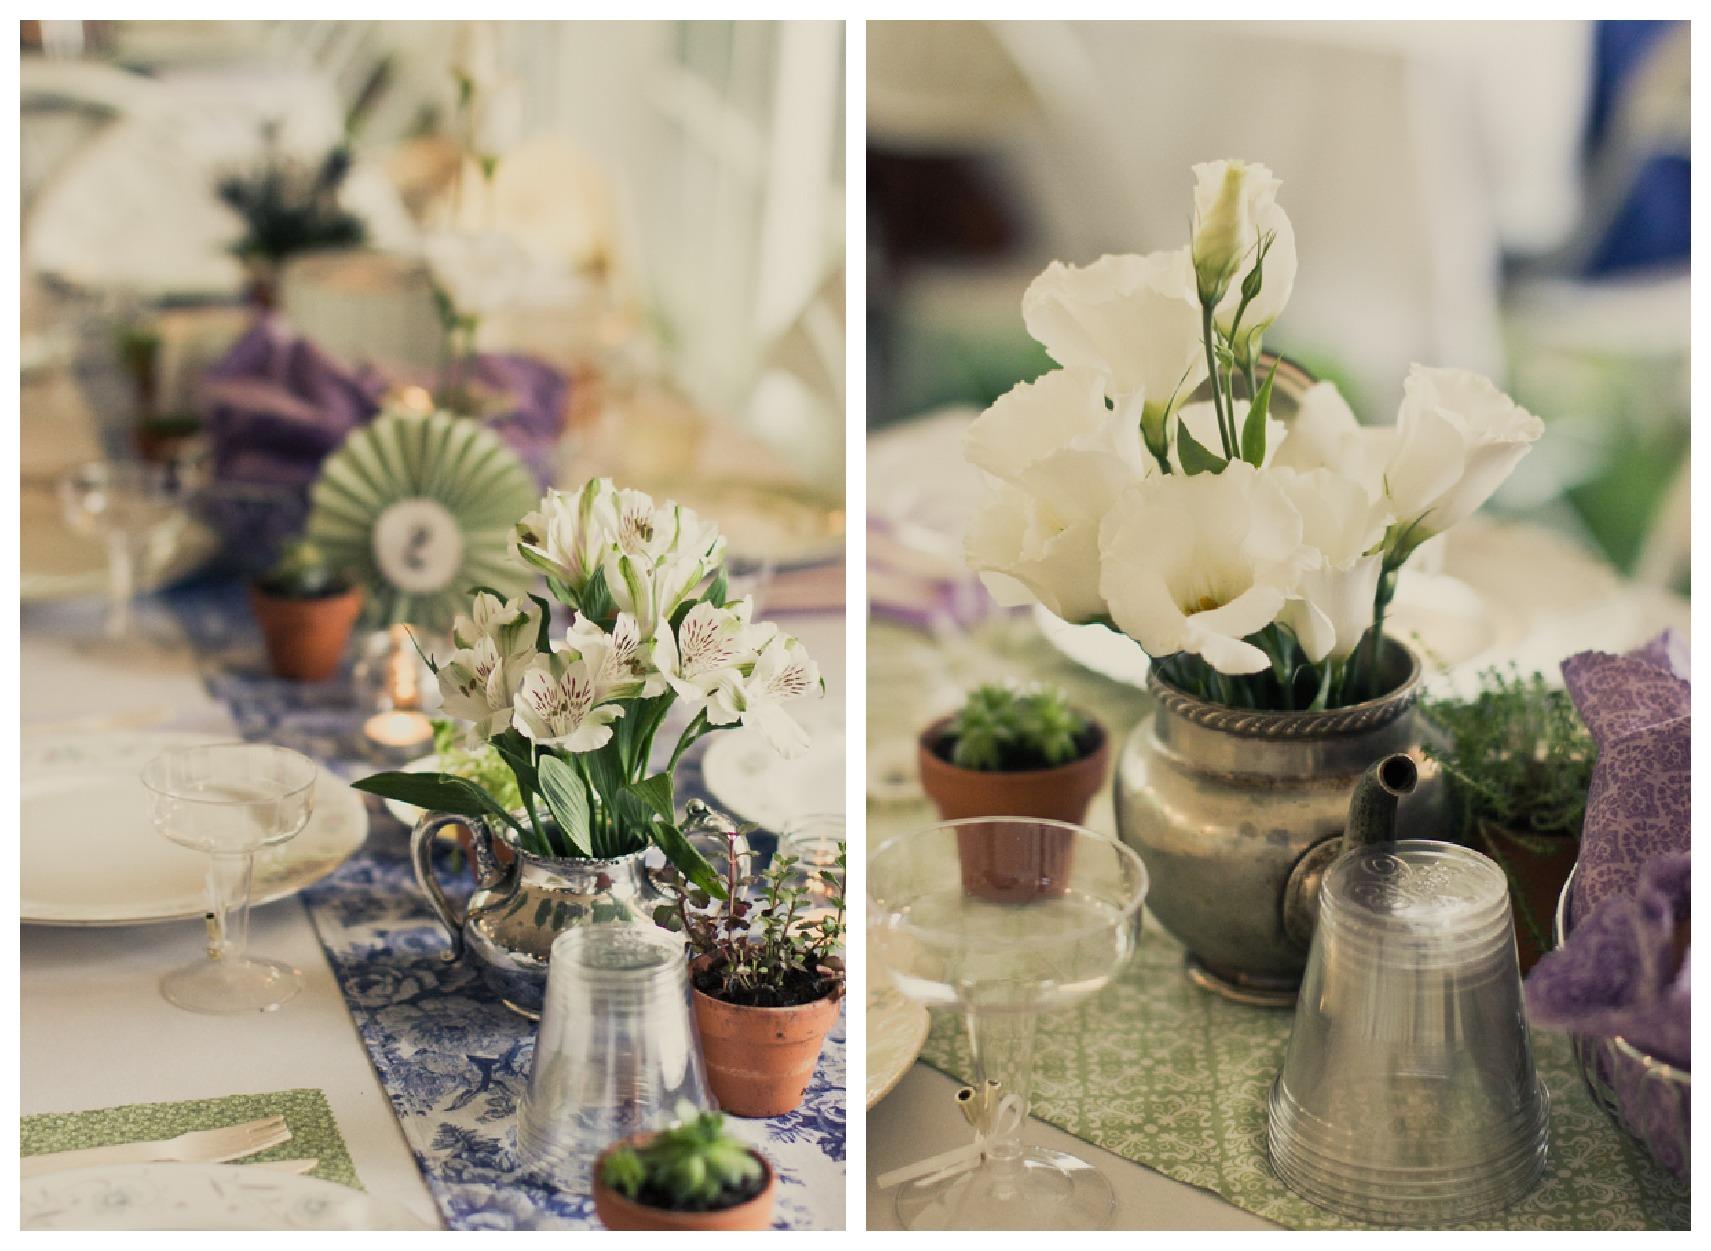 bakyard do it yourself wedding rustic wedding chic. Black Bedroom Furniture Sets. Home Design Ideas